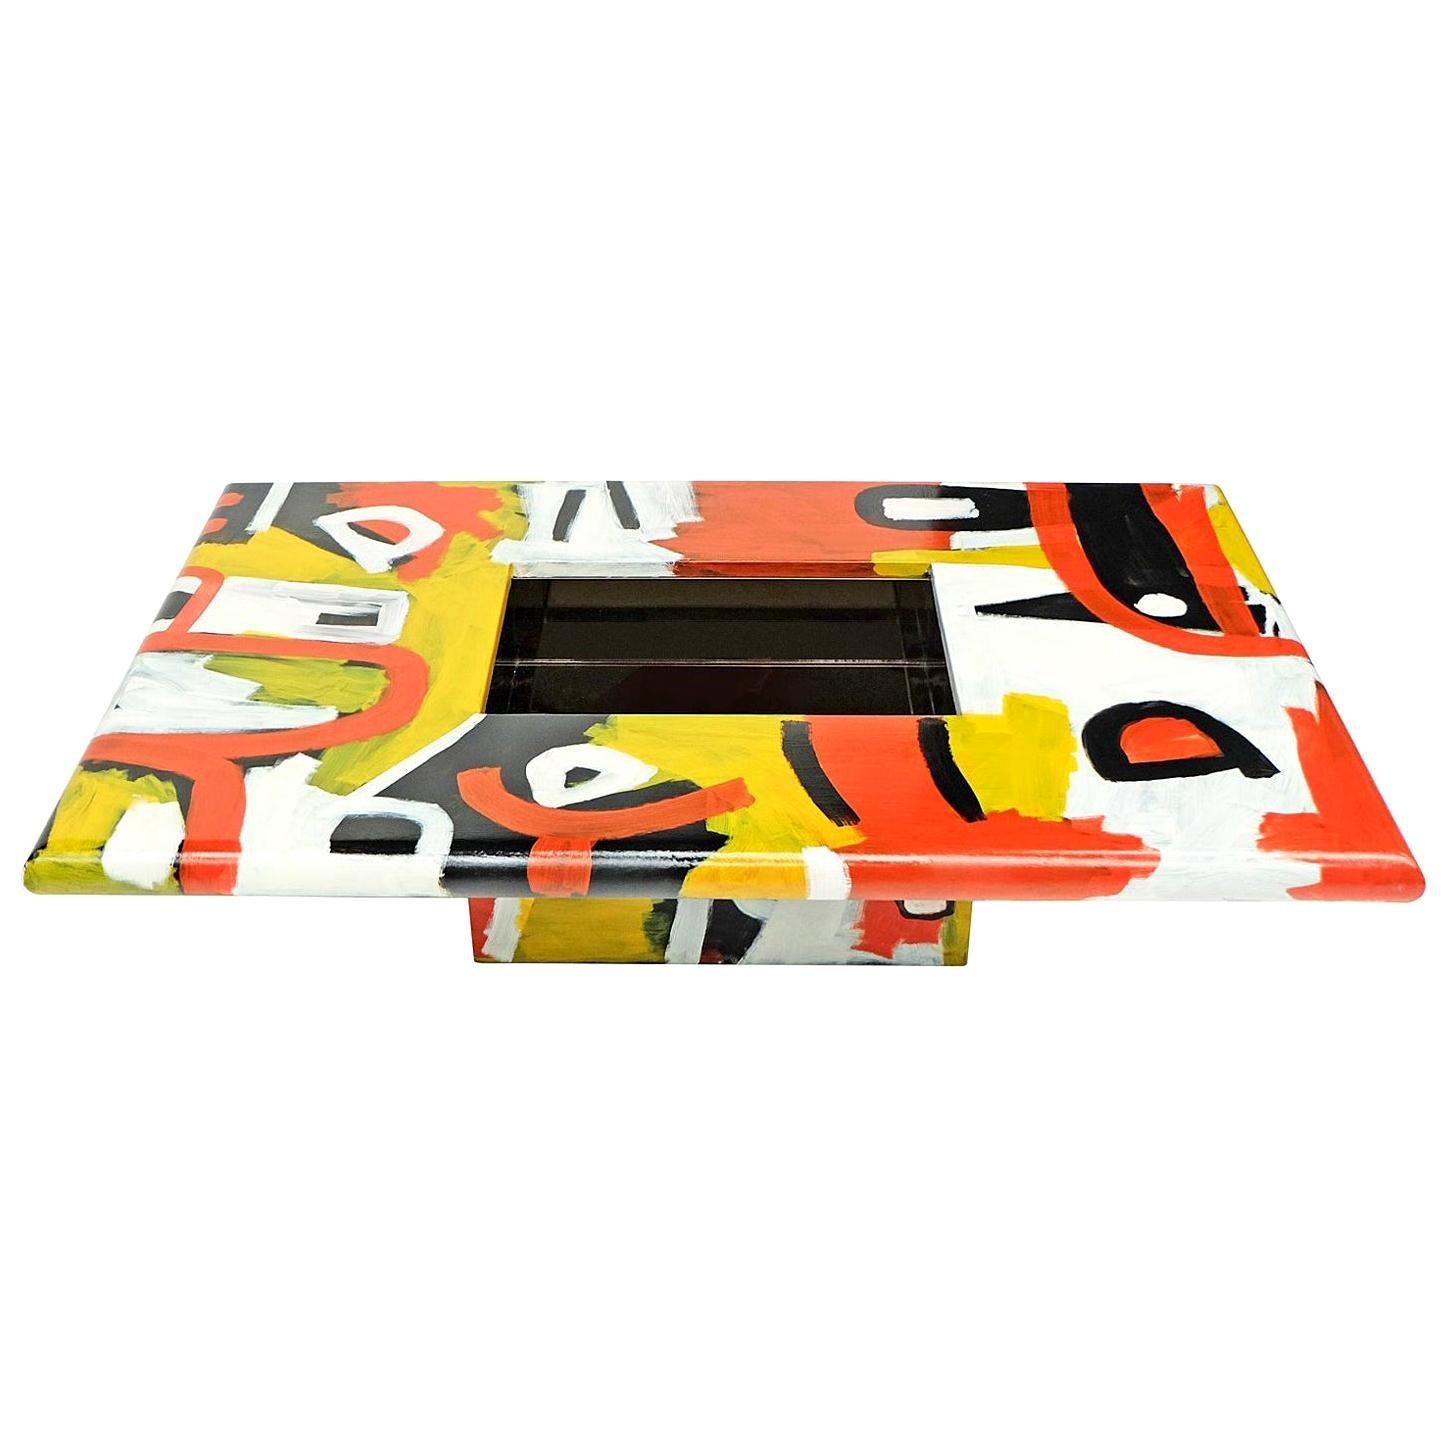 Studio Coffee Table a Bespoke Piece of Art Furniture Tribal Design